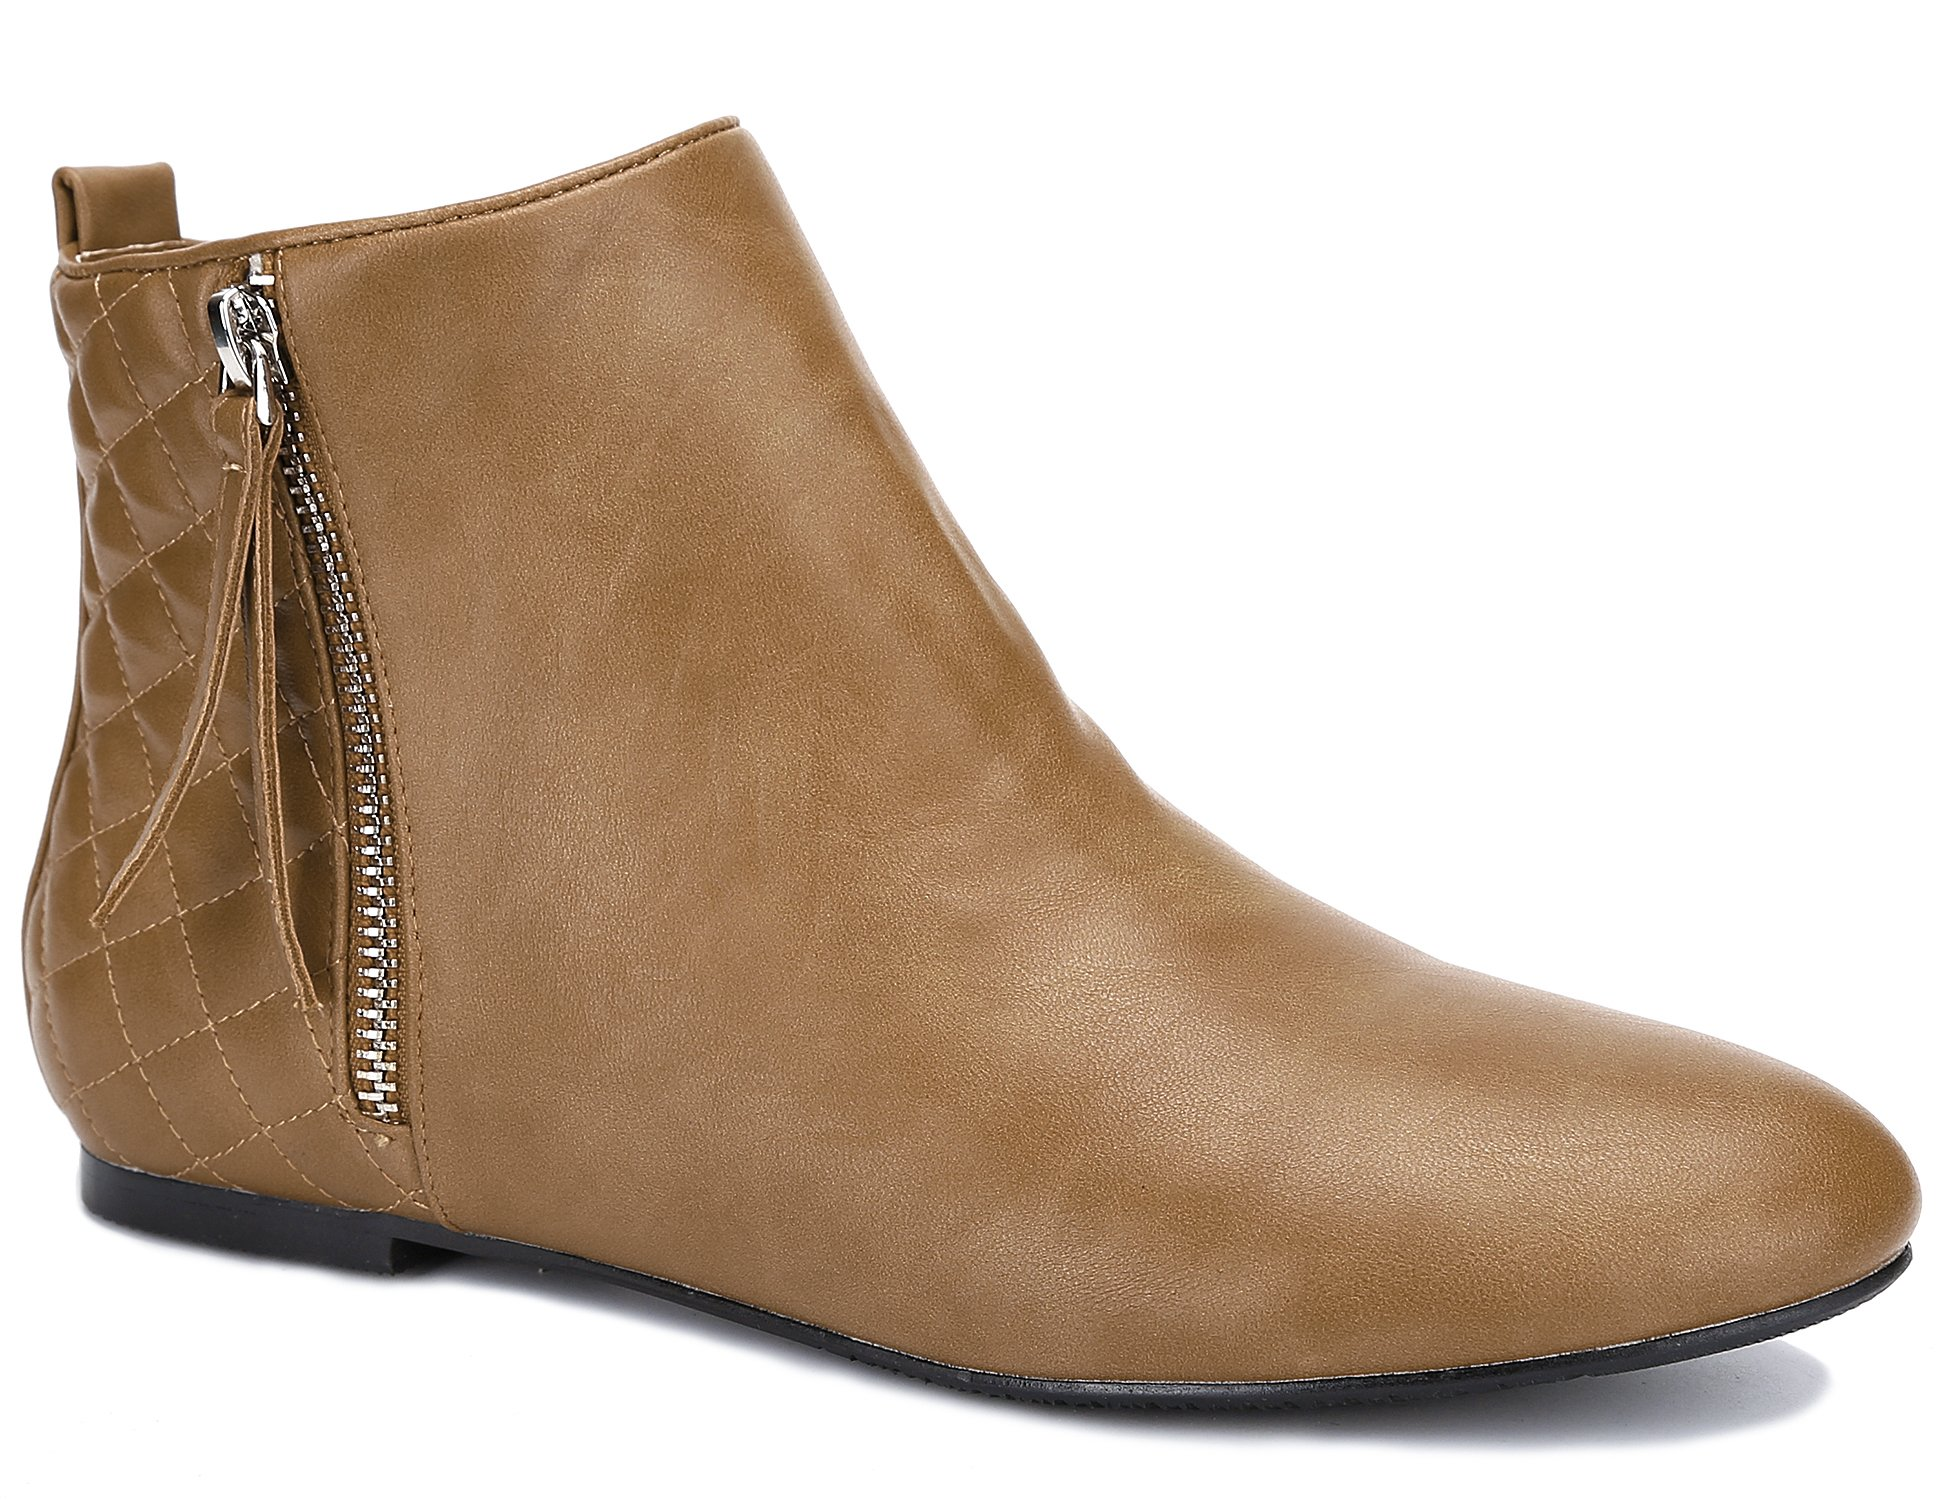 MaxMuxun Women Shoes Flats Classic Ankle Boots (39 EU/8 US, Camel PU)